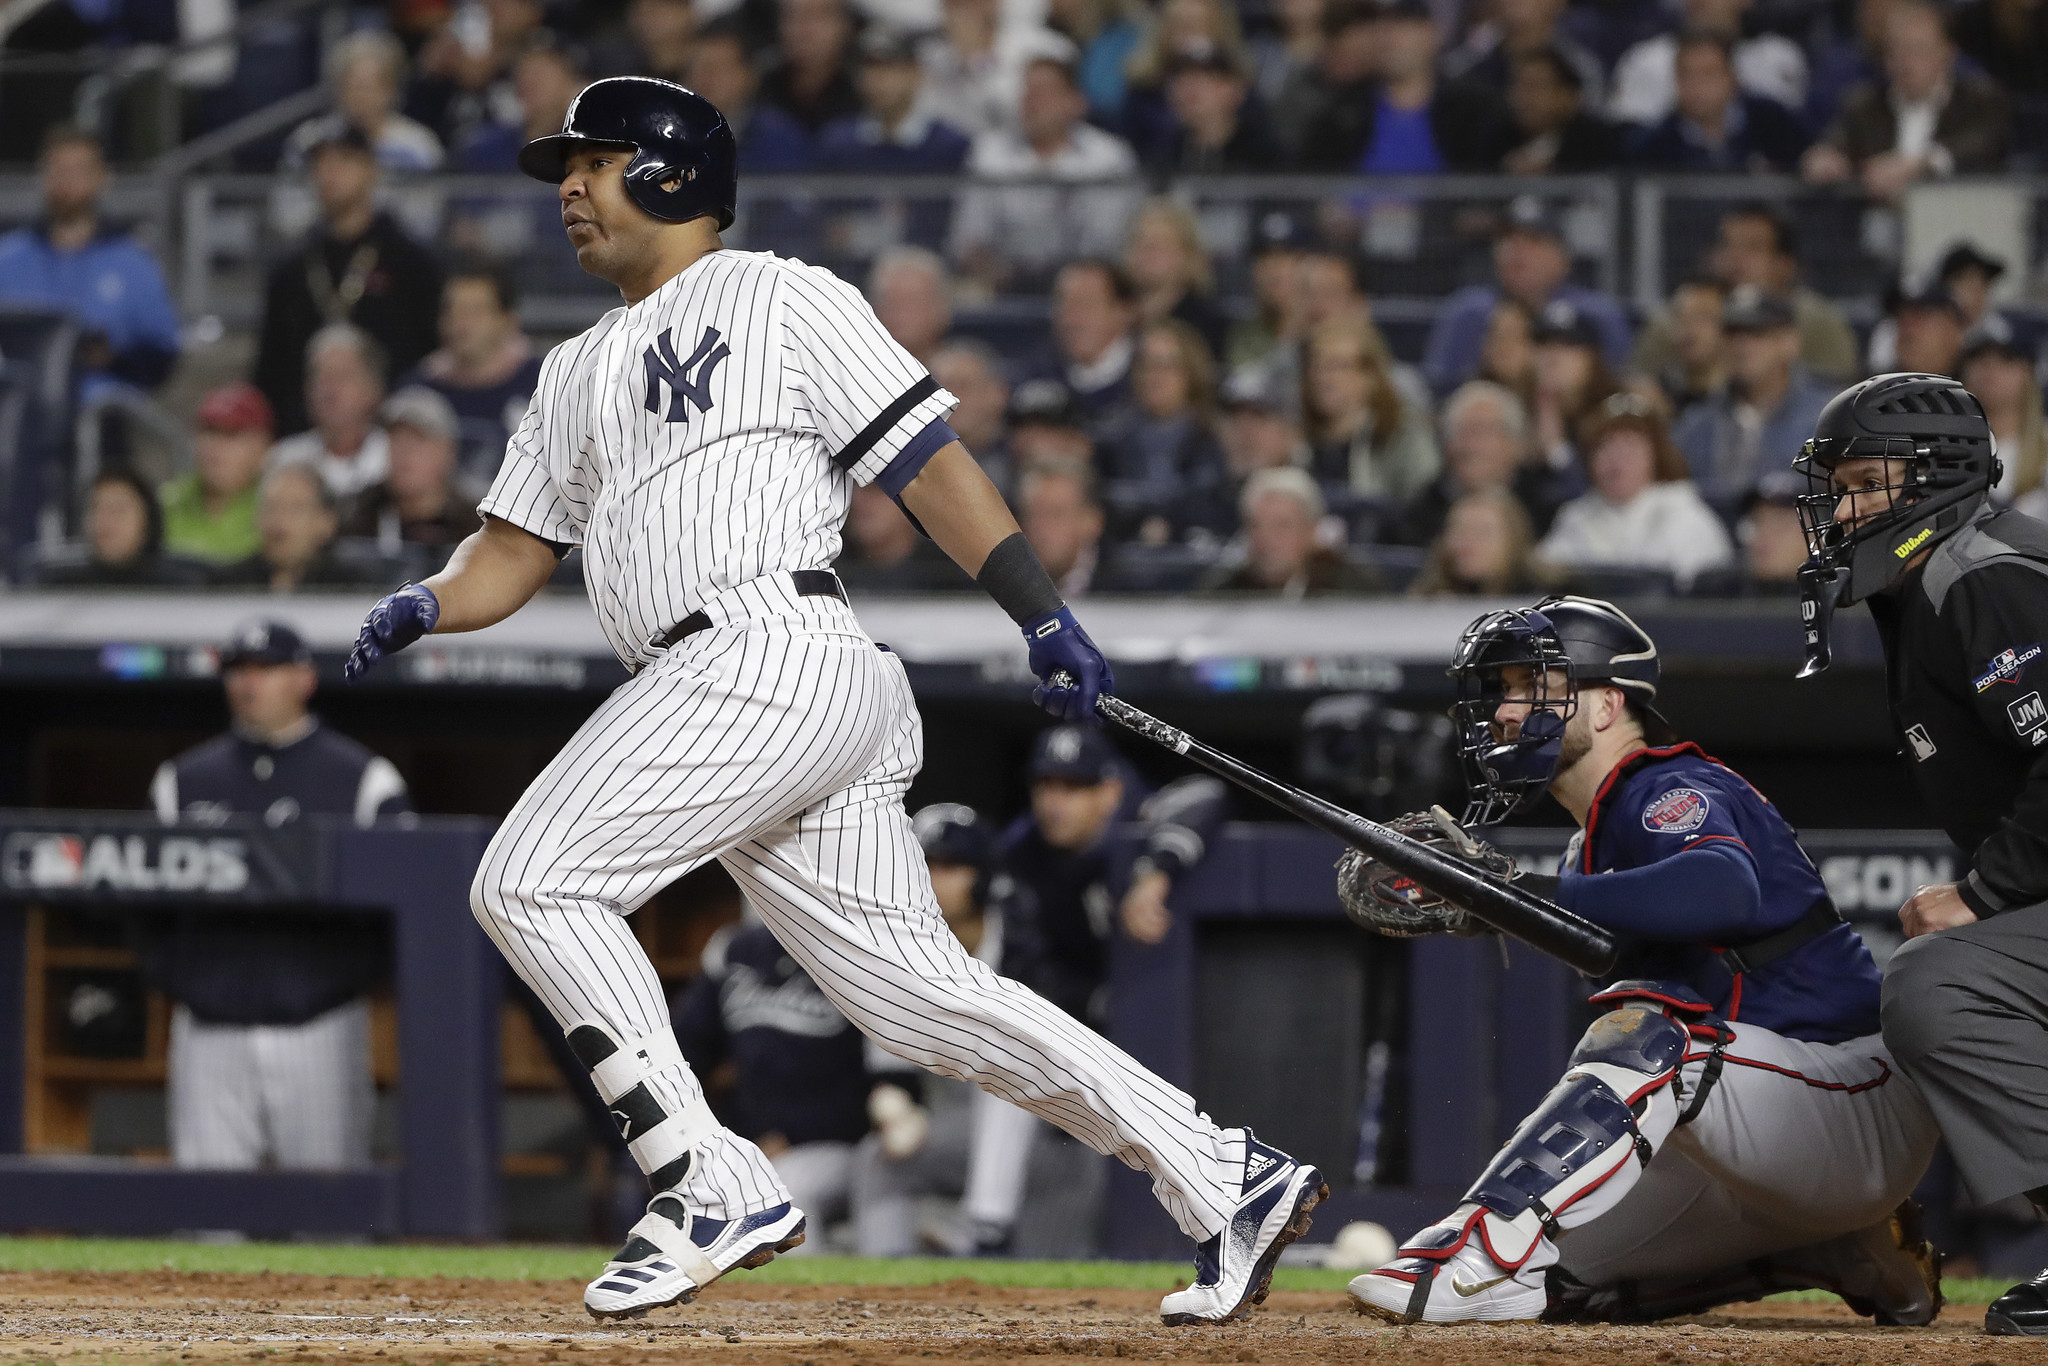 Yankees decline Edwin Encarnacion's 2020 option